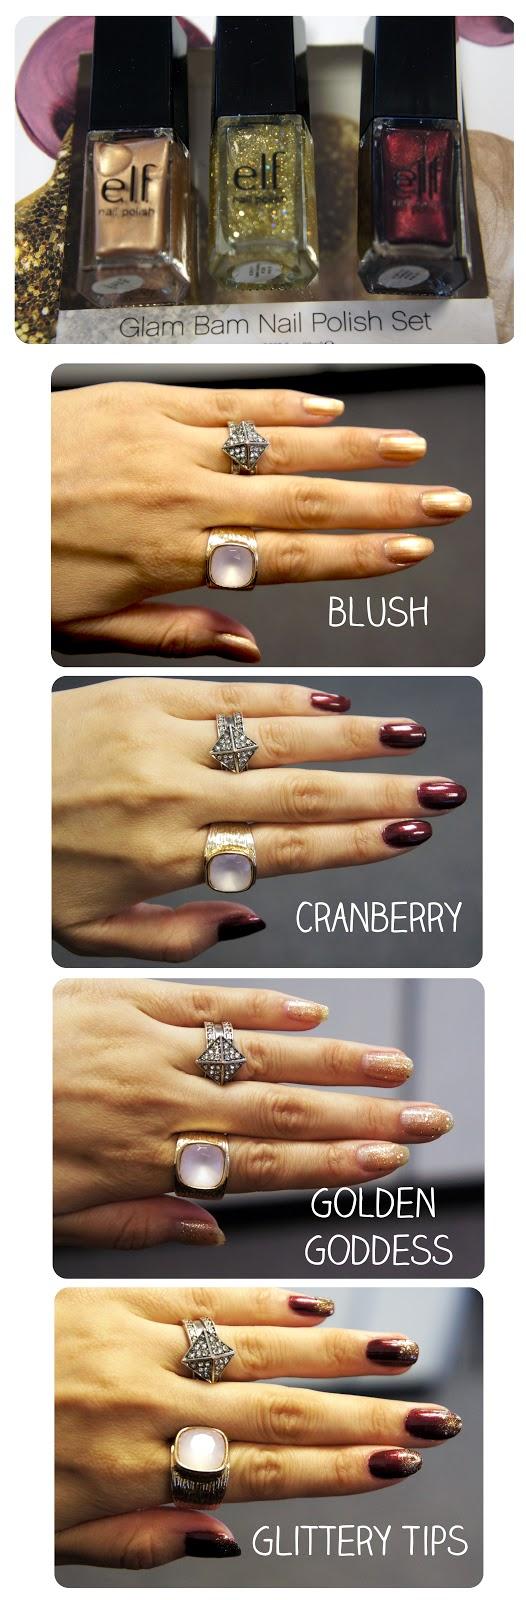 NEW elf Nail Polish Set - Glam Bam | Nails nails nails! | Pinterest